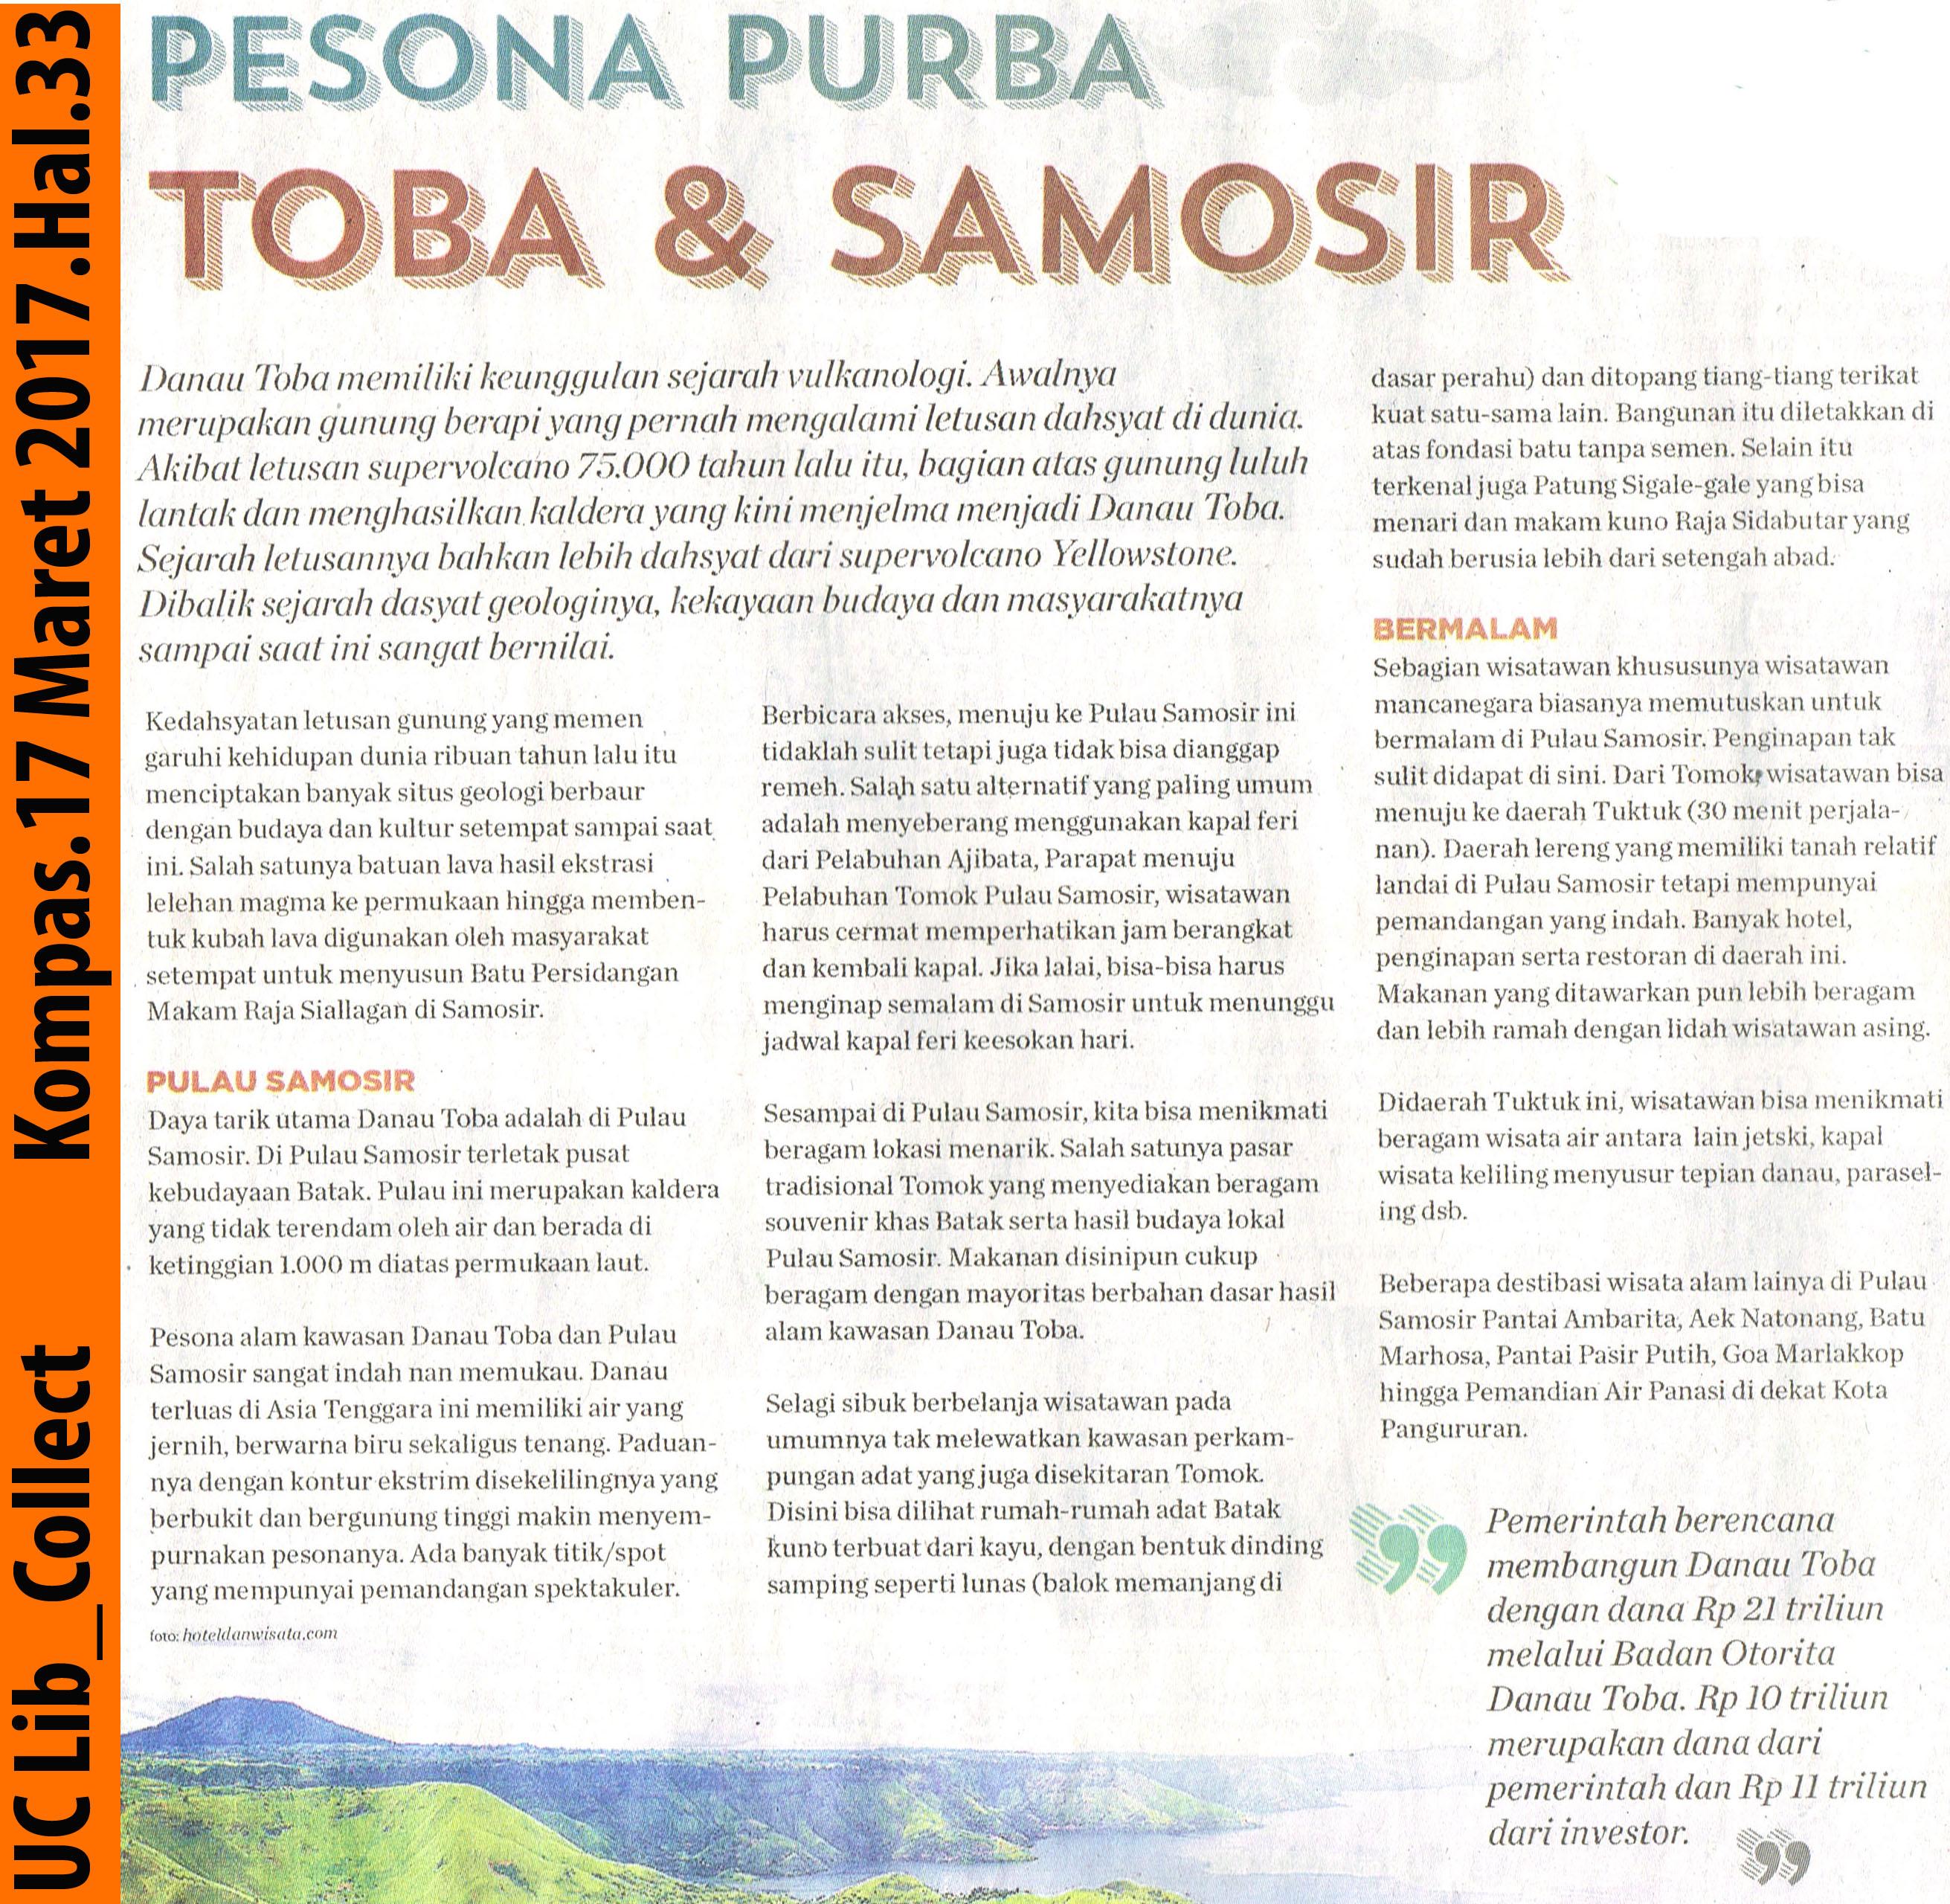 Pesona Purba Toba dan Samosir.Kompas.17 Maret 2017.Hal.33